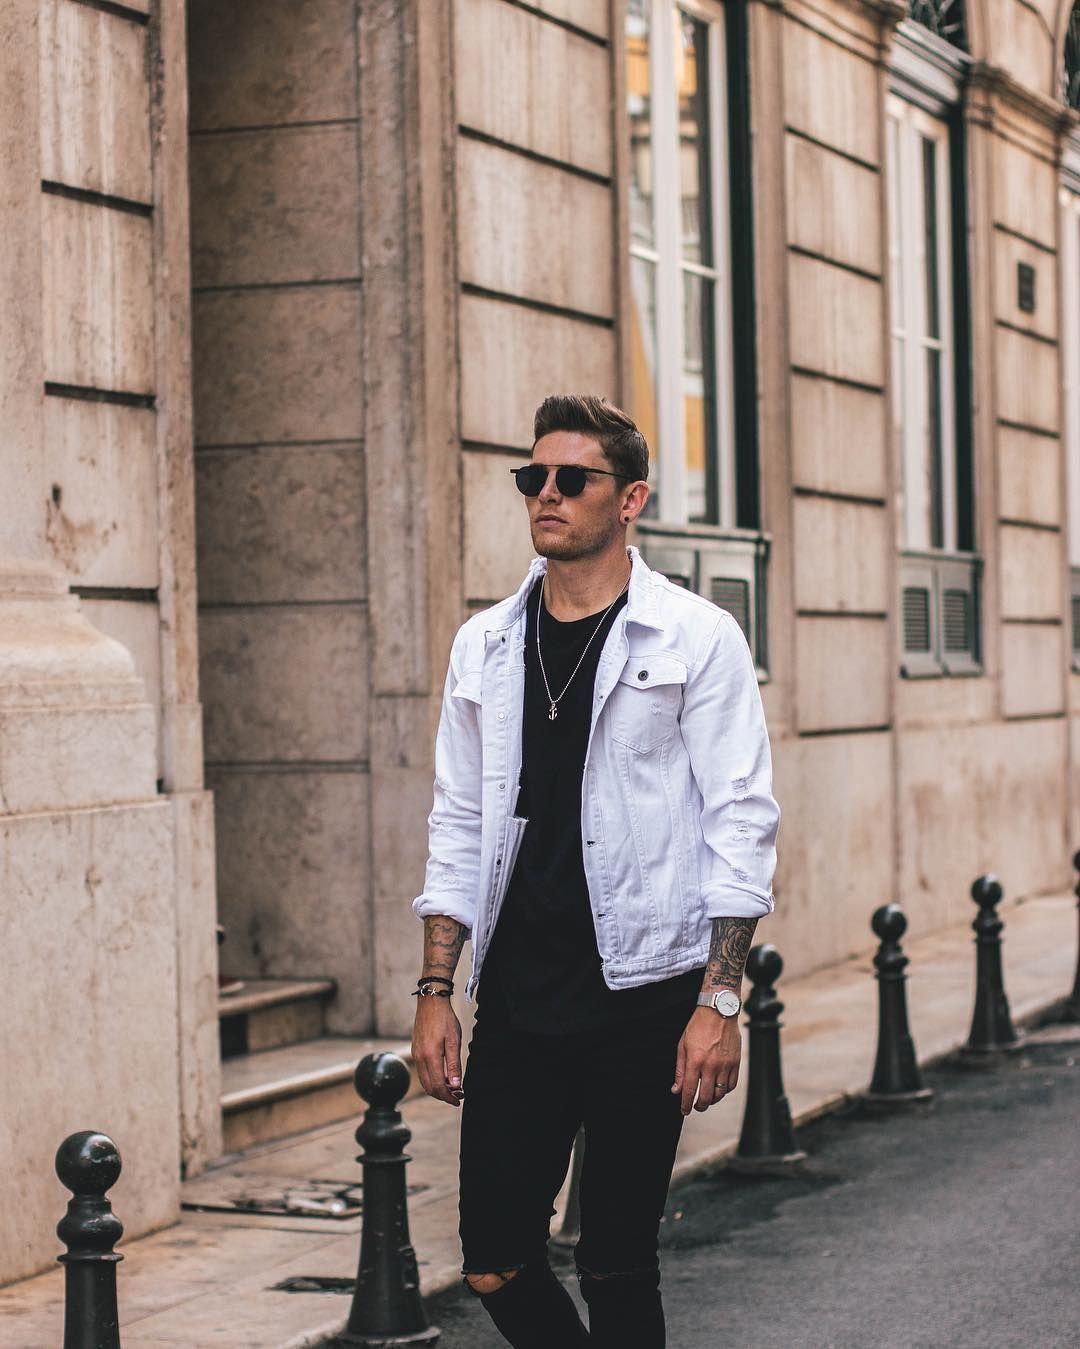 Finnerz Uk With A Street Style Minimal Combo Featuring A White Denim Jacket Black T Shirt Sunglass White Denim Jacket Mens Jeans Outfit Men White Denim Jacket